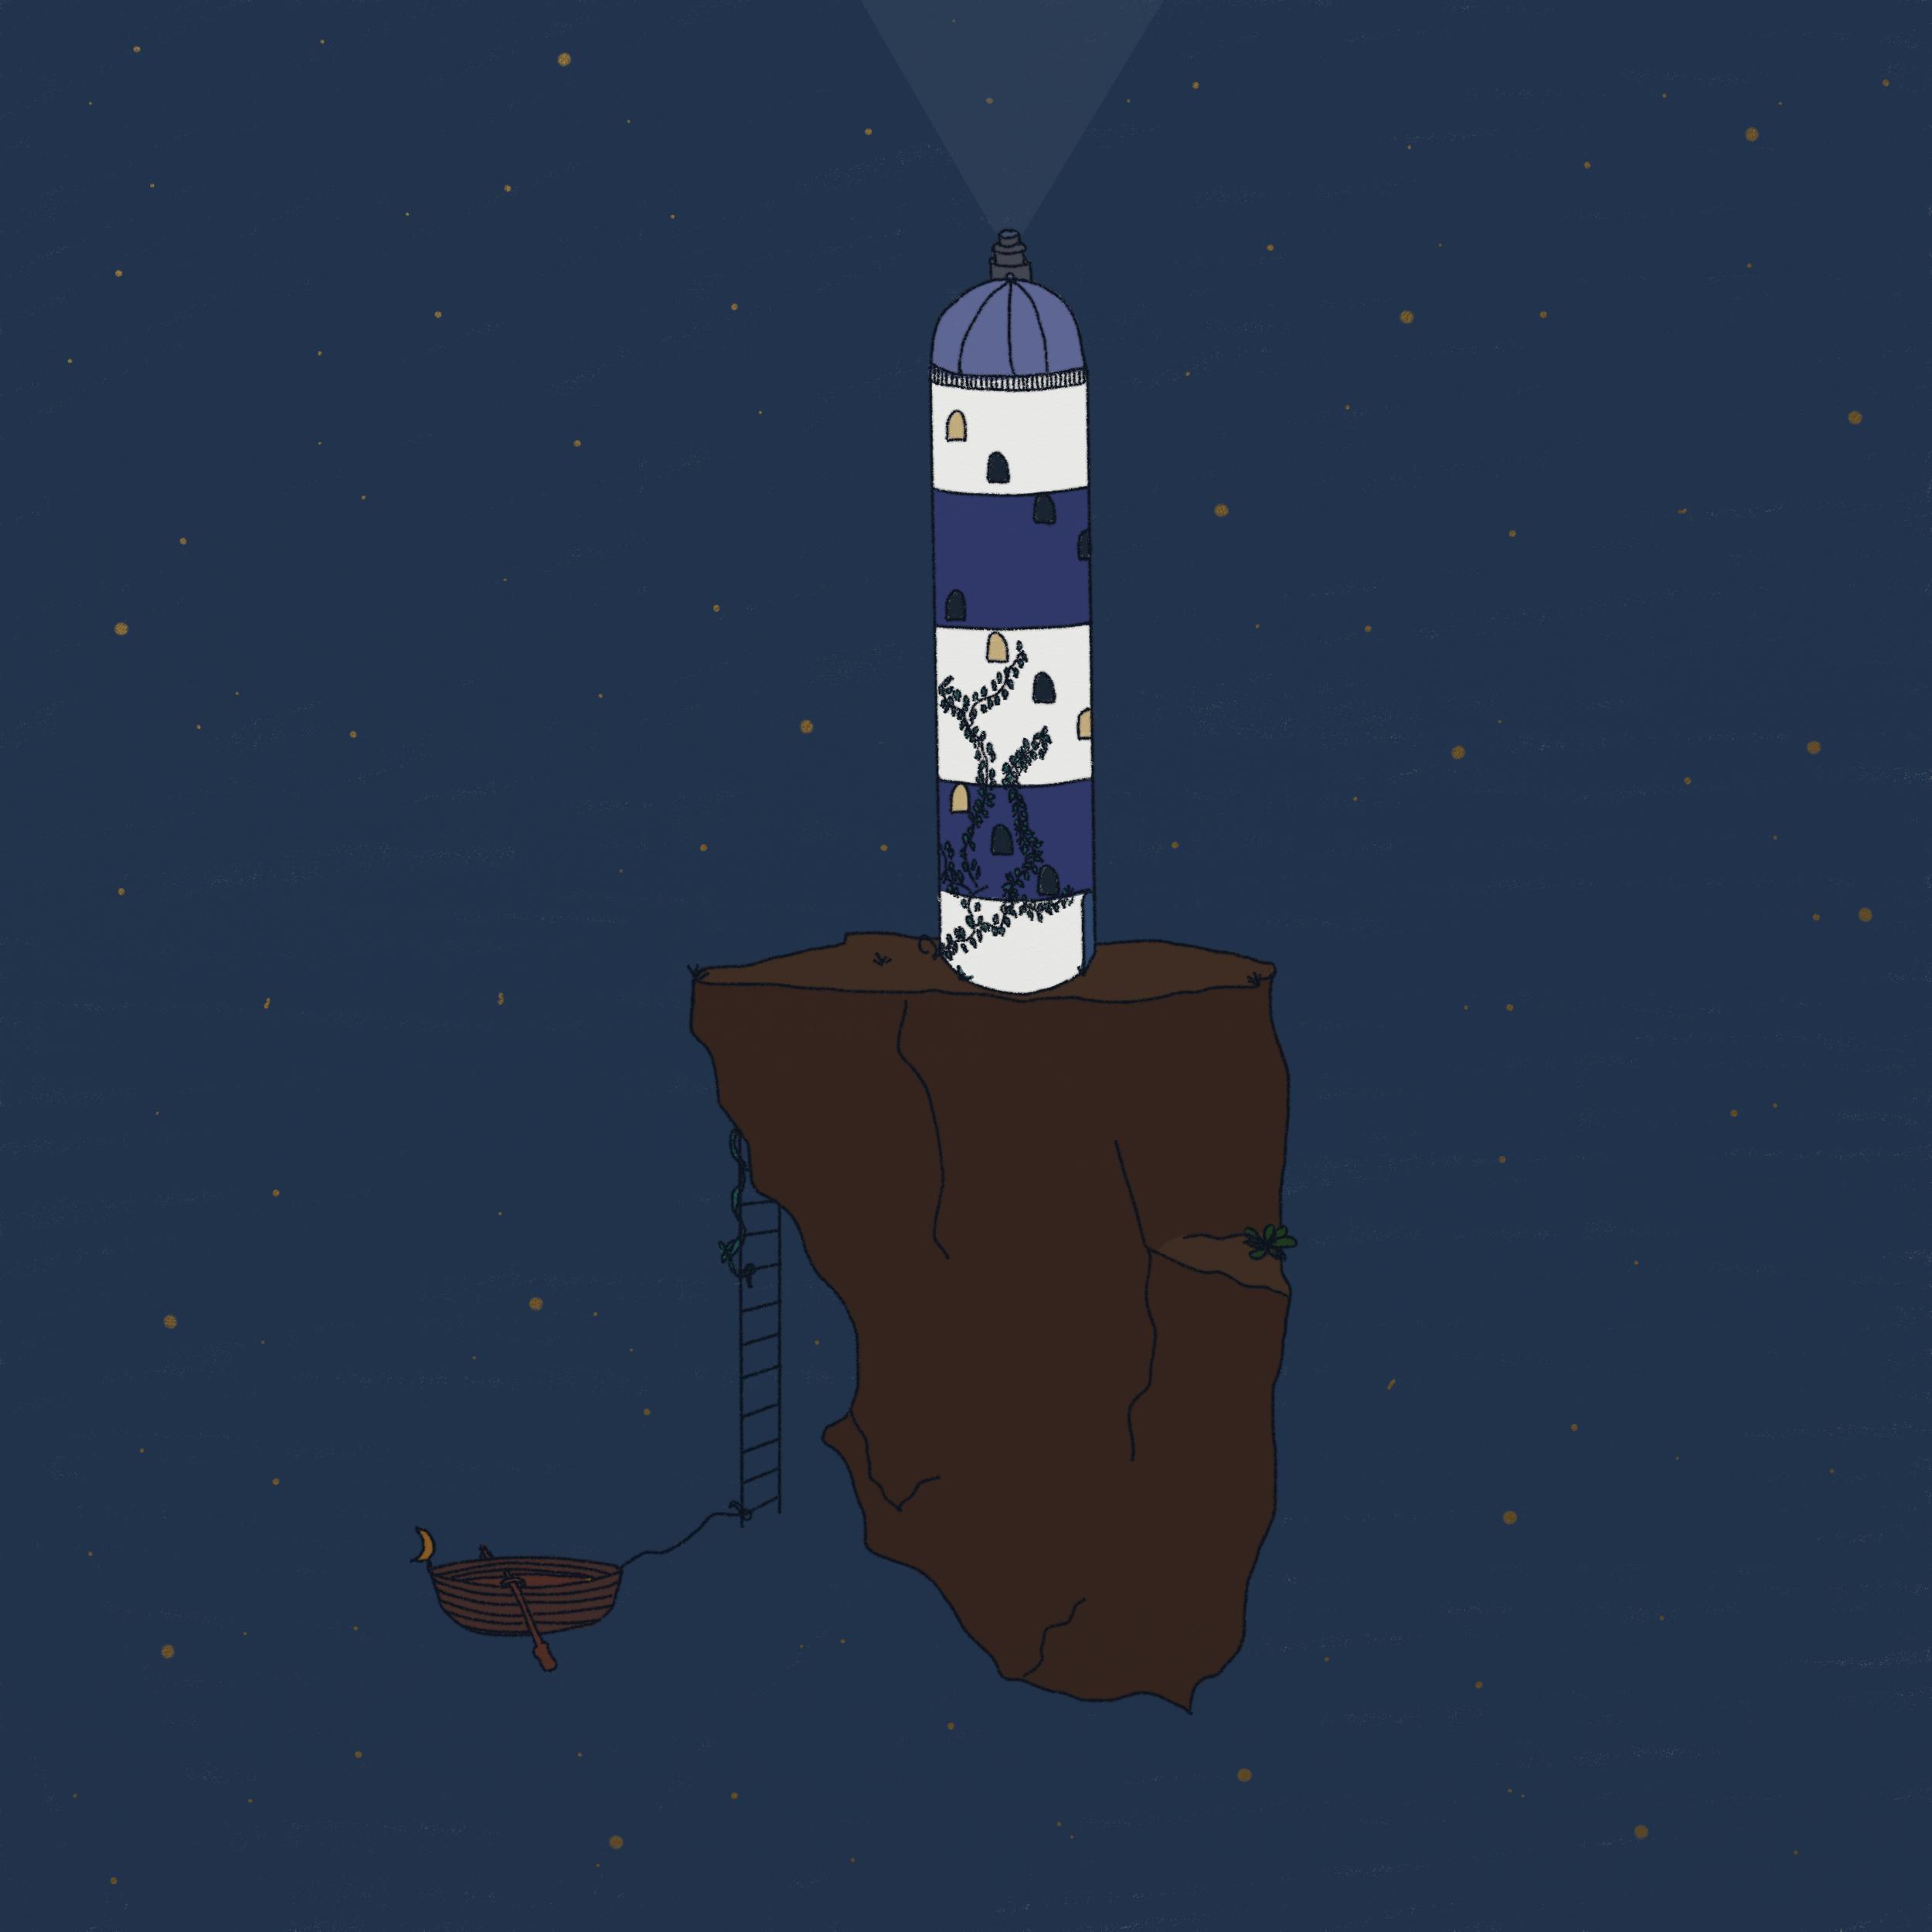 L'observatoire _ 2.png